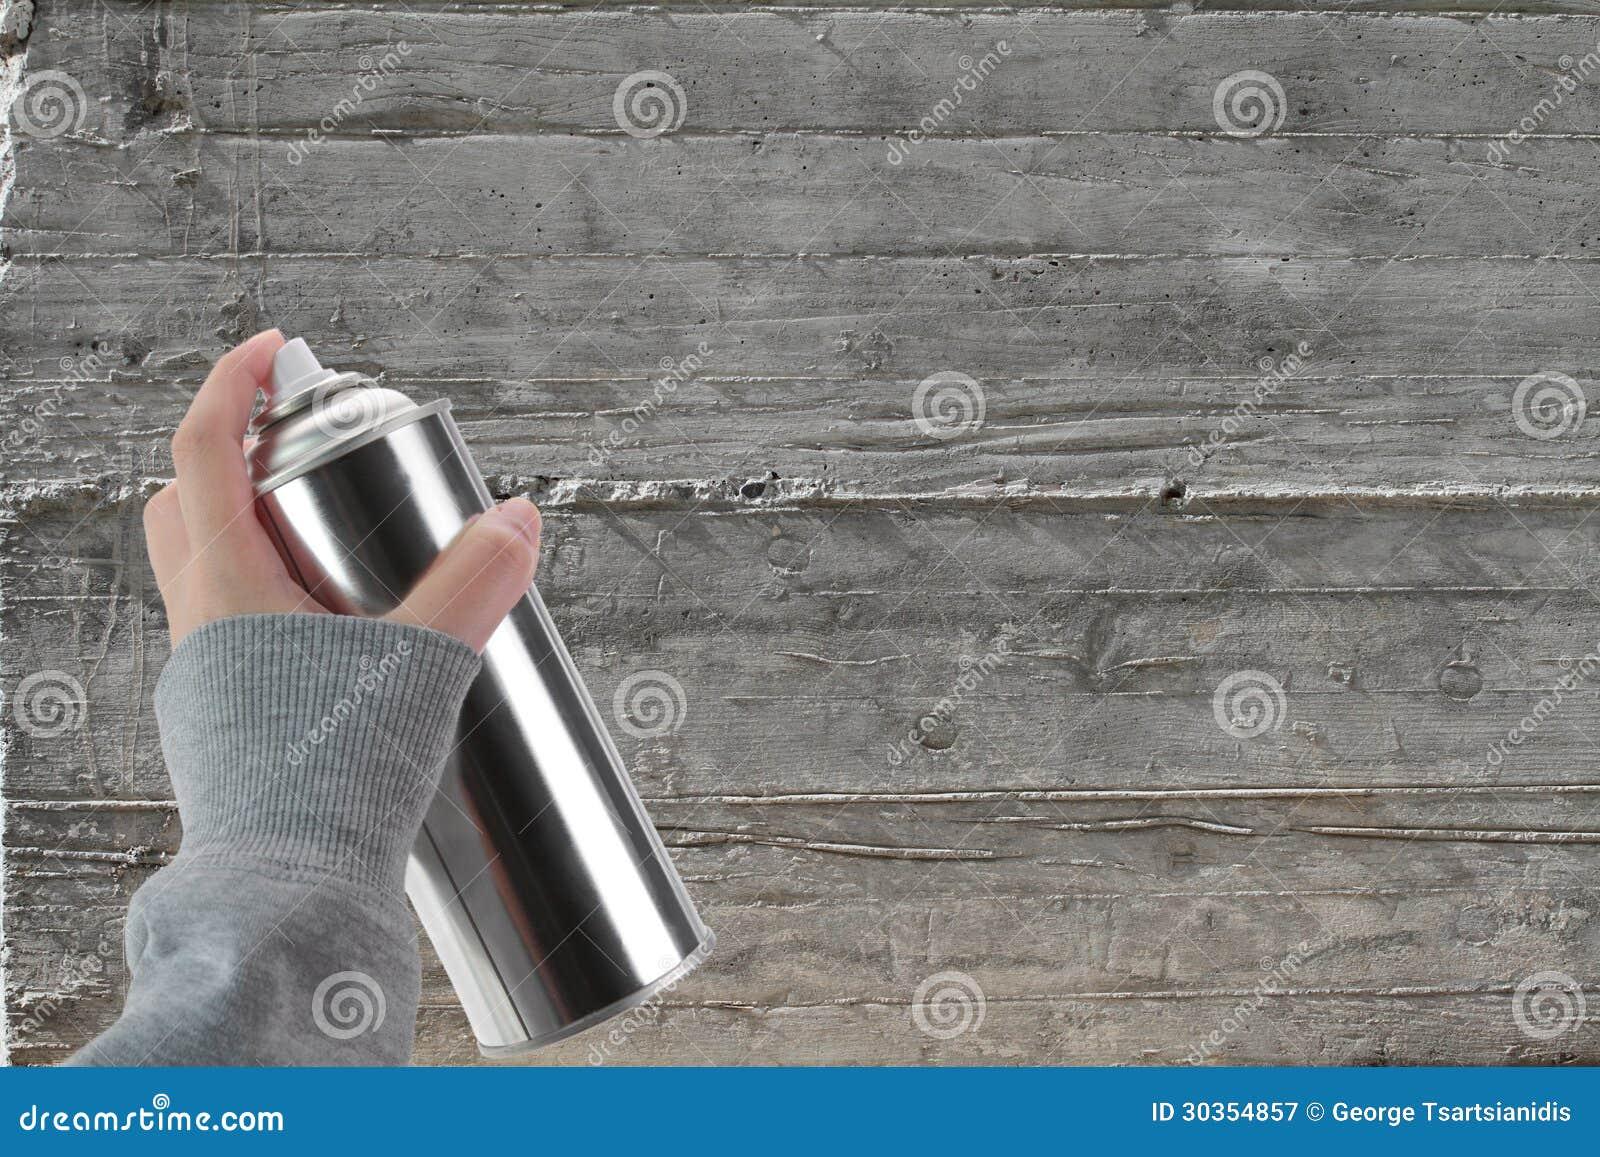 Cement Wall Graffiti : Human hand holding a graffiti spray can stock image